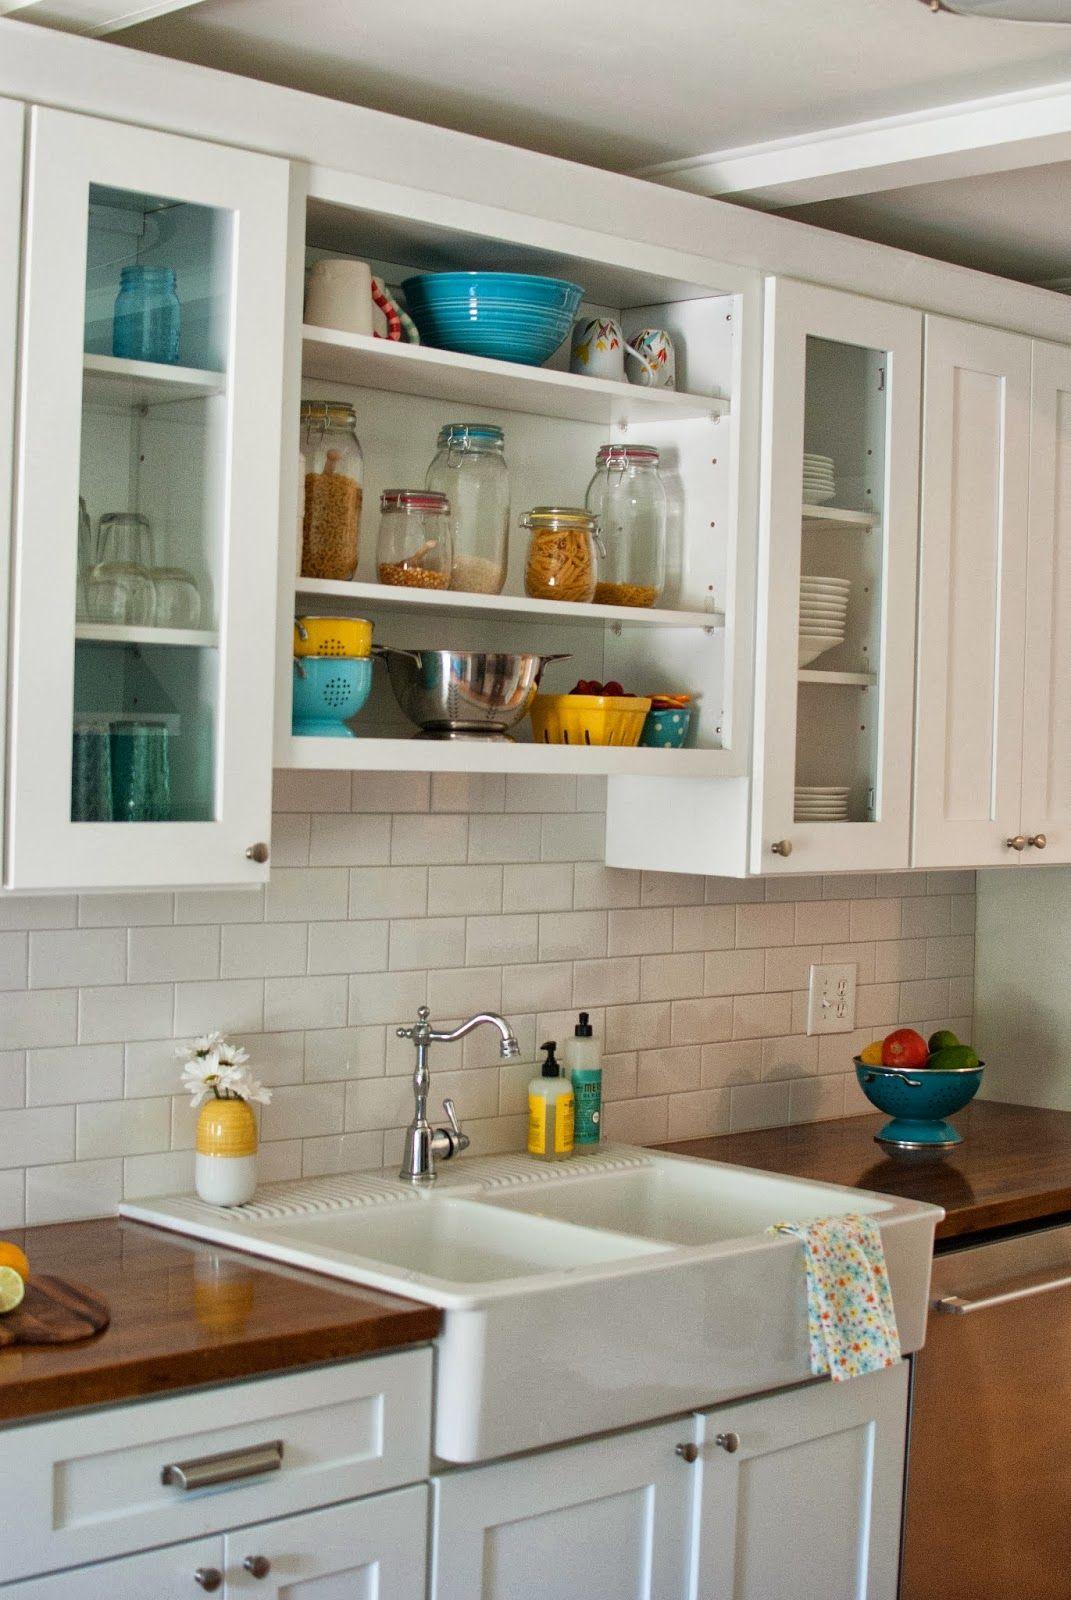 butcher block countertop tile backsplash butcher block kitchen countertops Subway Tile Backsplash With Butcher Block Google Search Cool